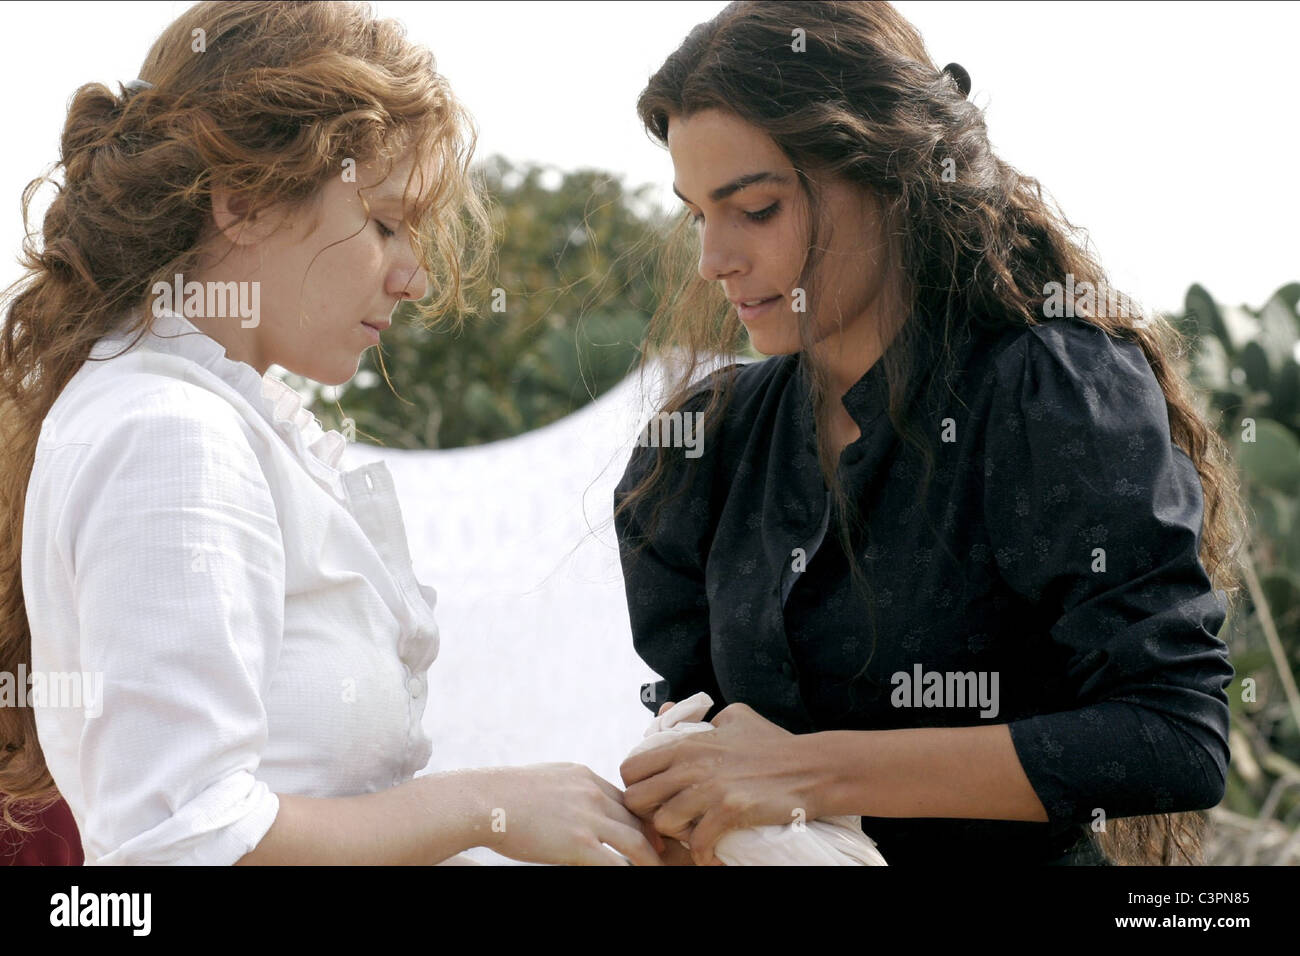 VALERIA SOLARINO & ISABELLA RAGONESE VIOLA DI MARE (2009) - Stock Image